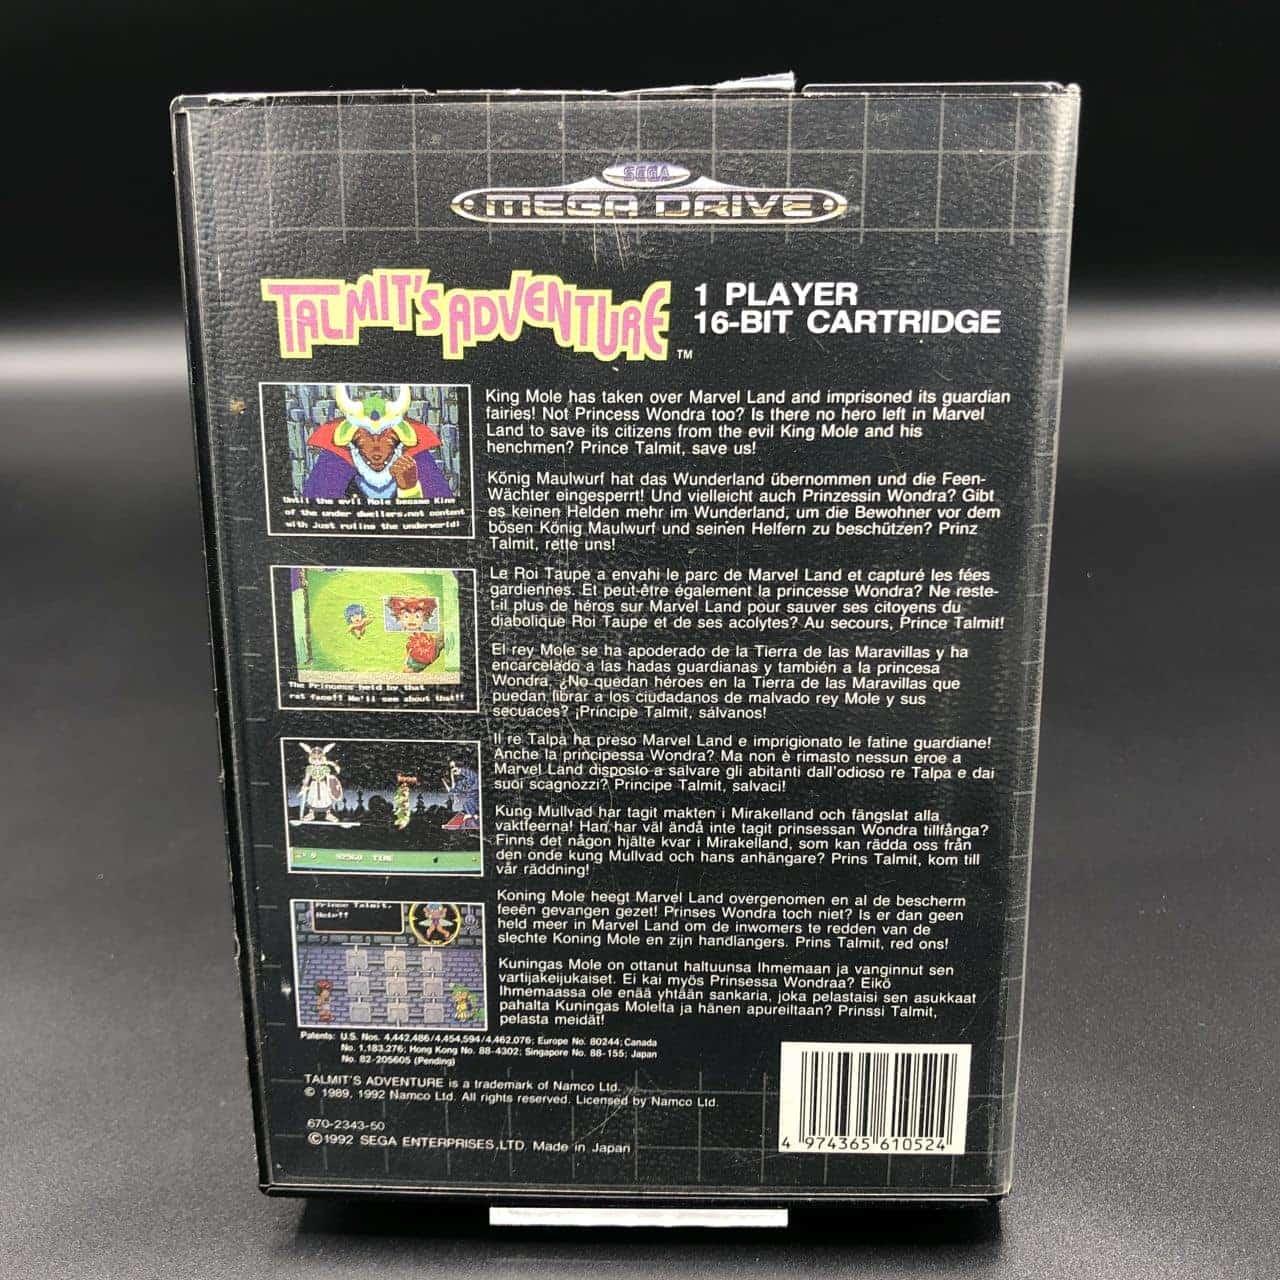 Talmit's Adventure (ohne Anleitung) (Sehr gut) Sega Mega Drive